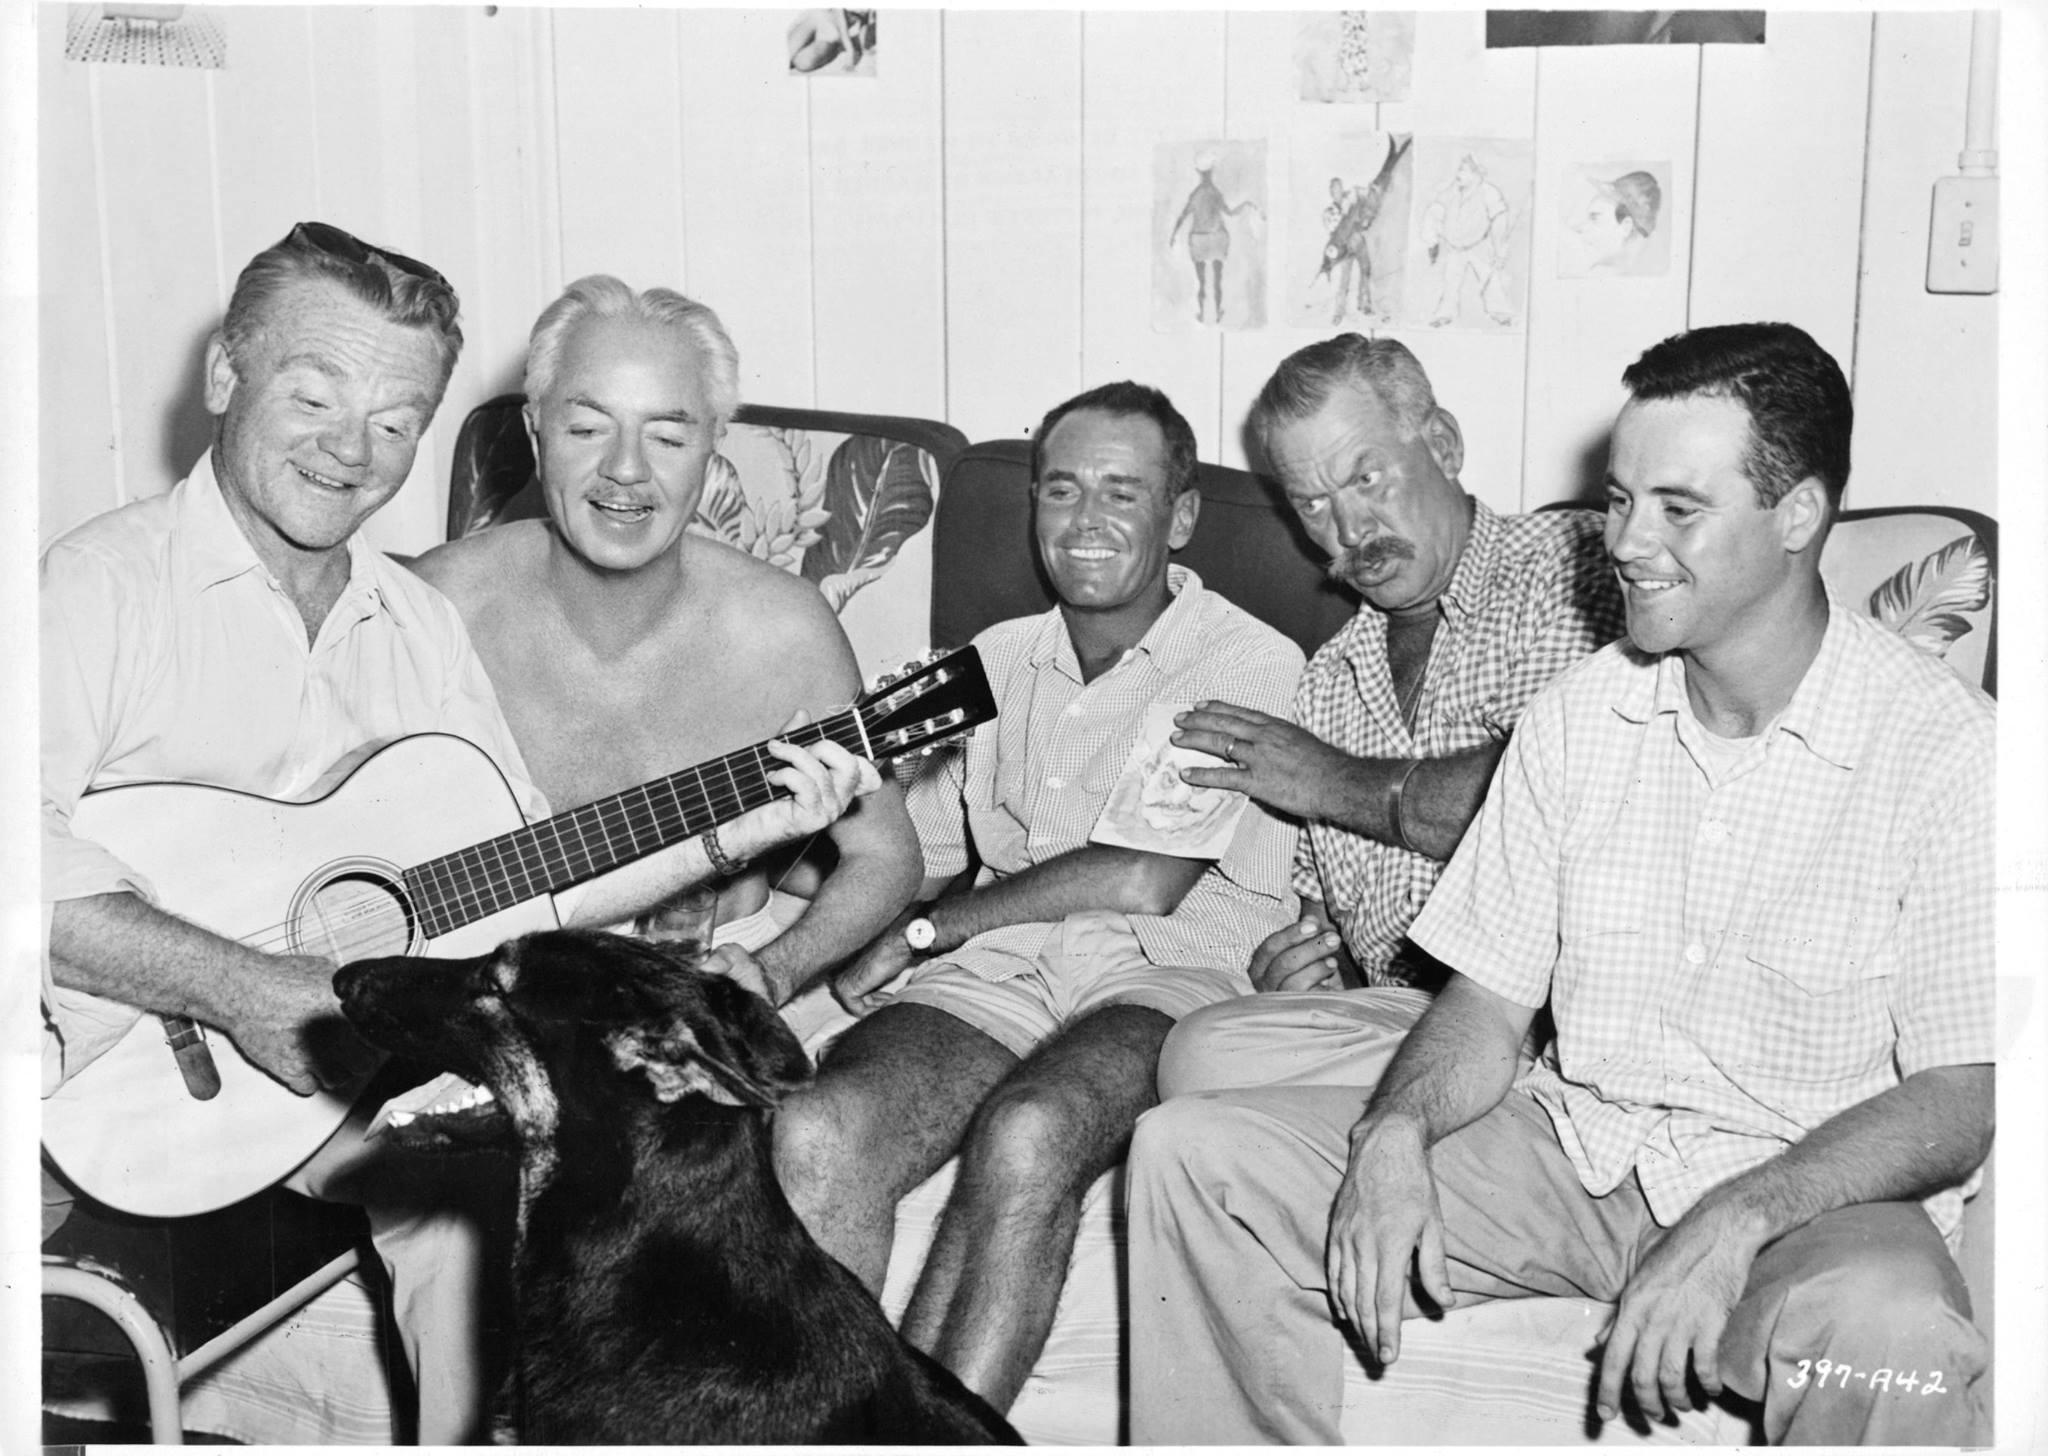 James Cagney, William Powell, Henry Fonda, Ward Bond and Jack Lemmon